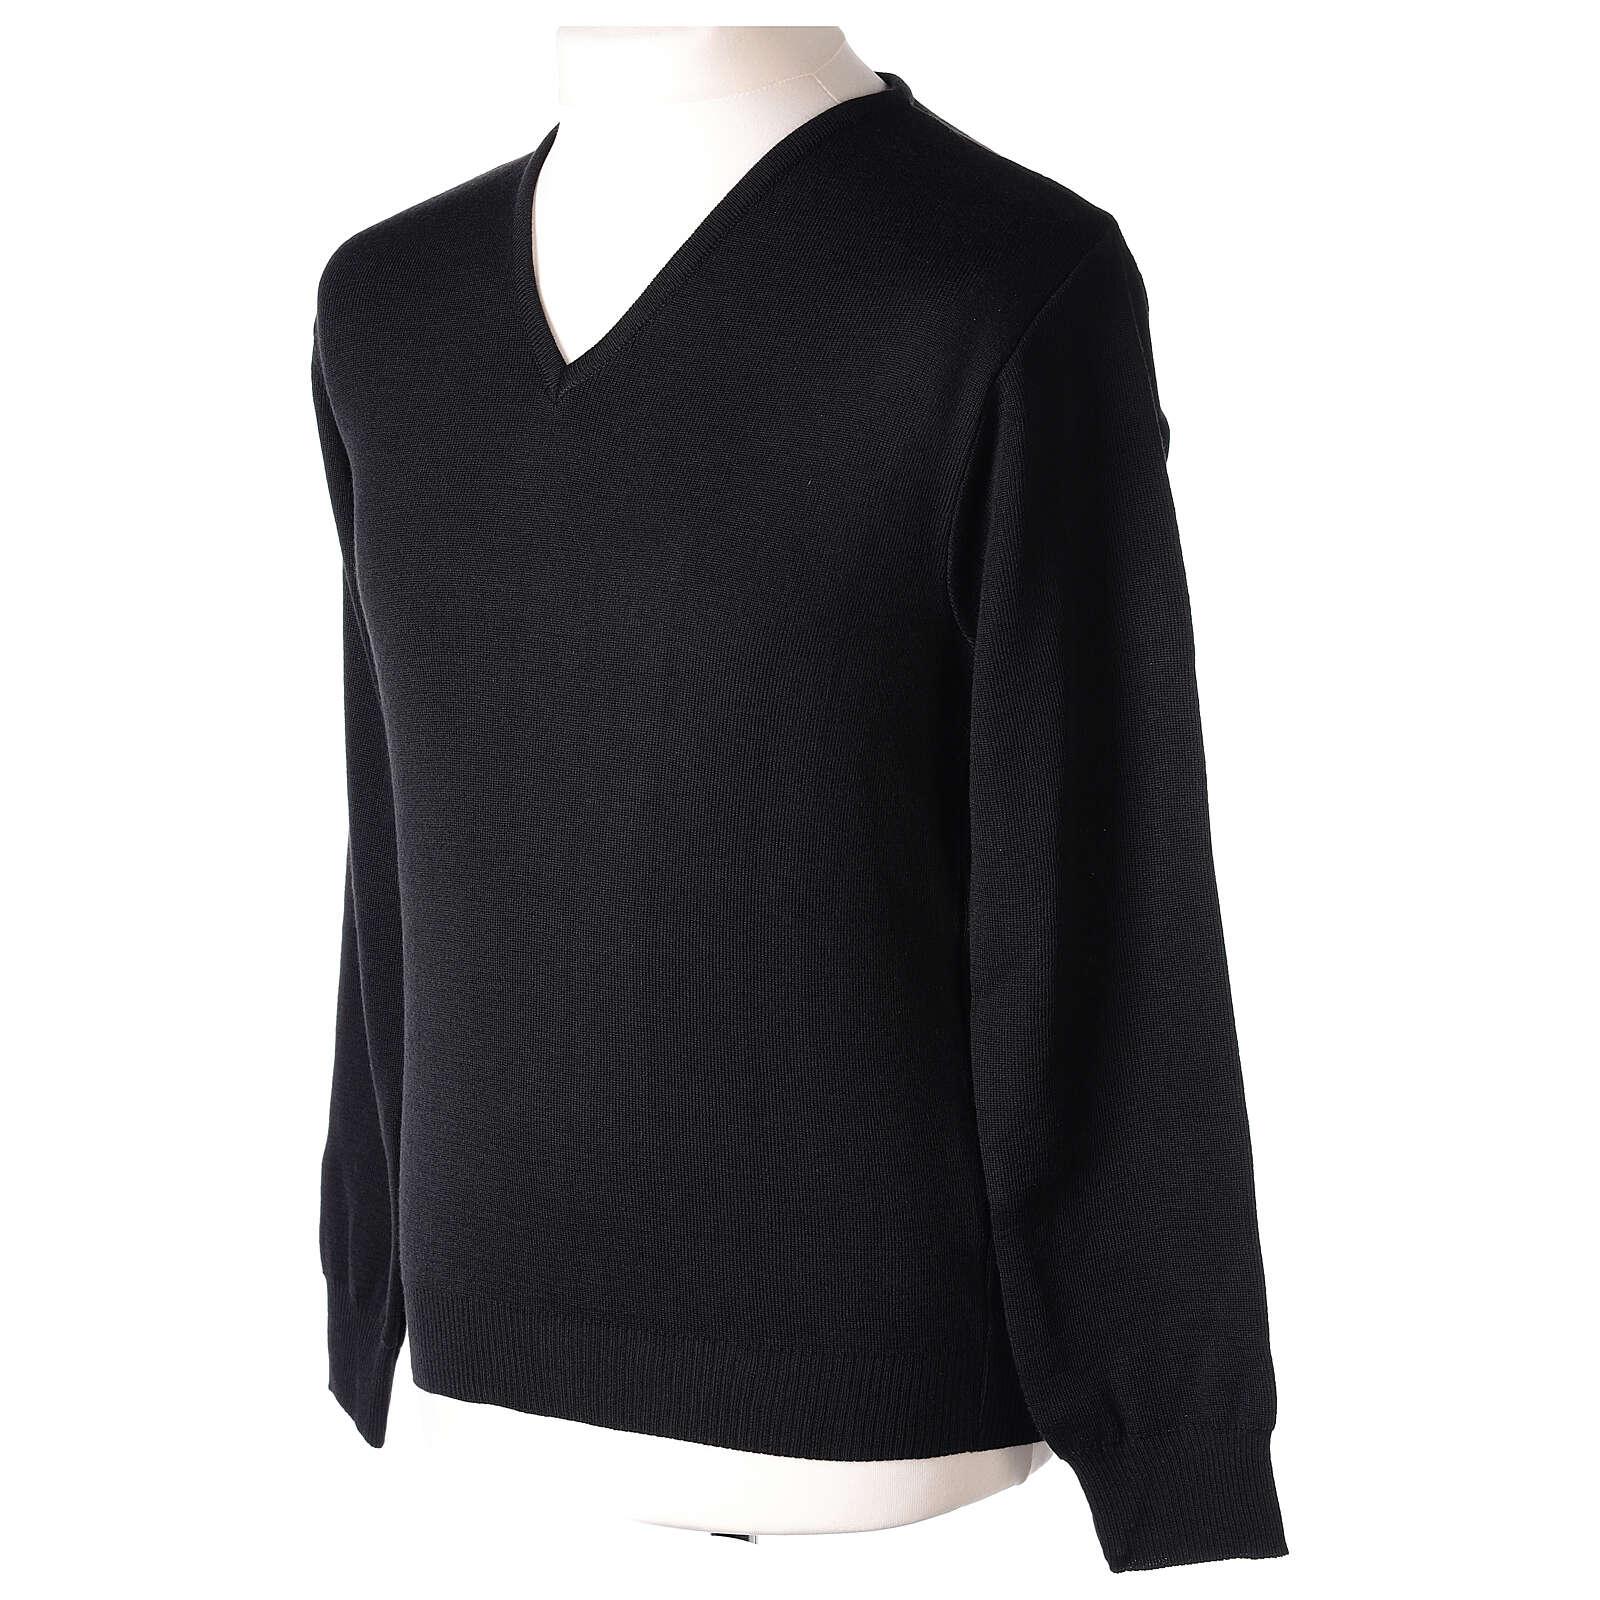 V-neck black clergy jumper plain fabric 50% acrylic 50% merino wool 4